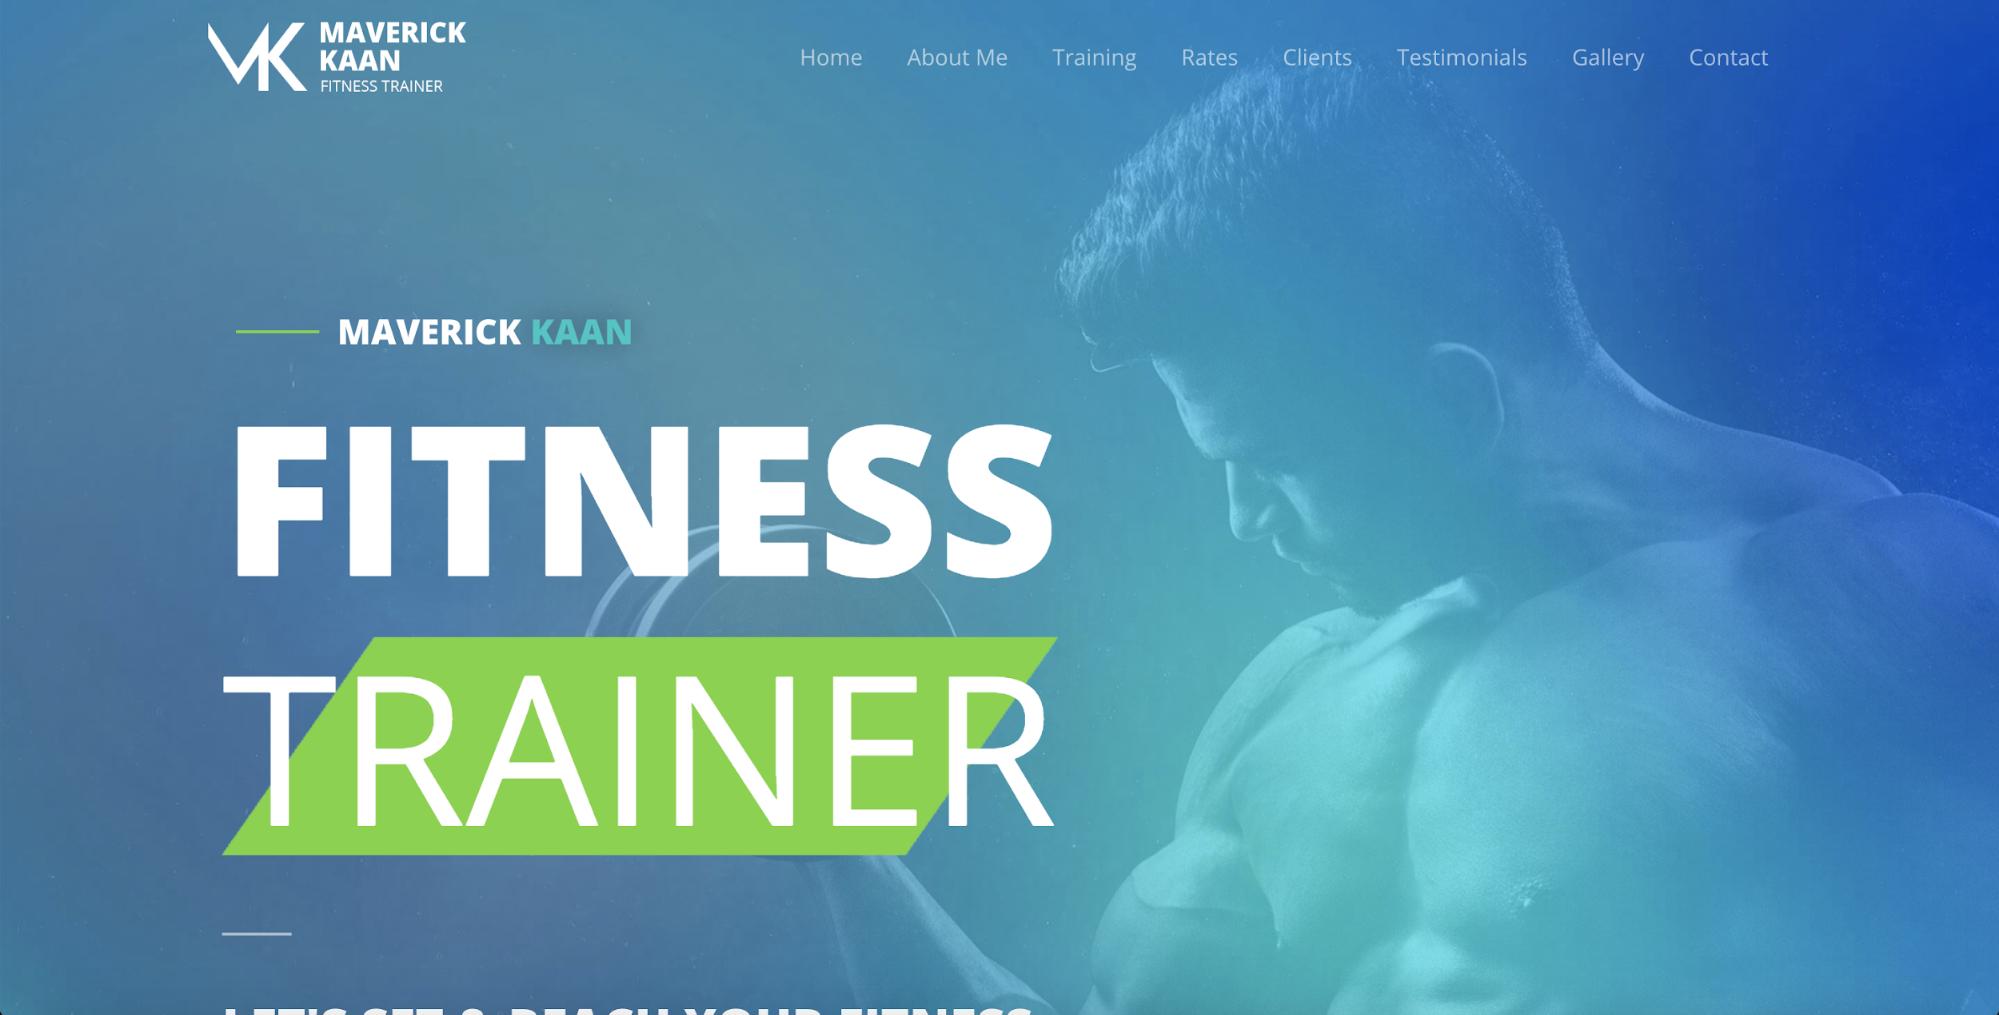 fitness trainer starter templates